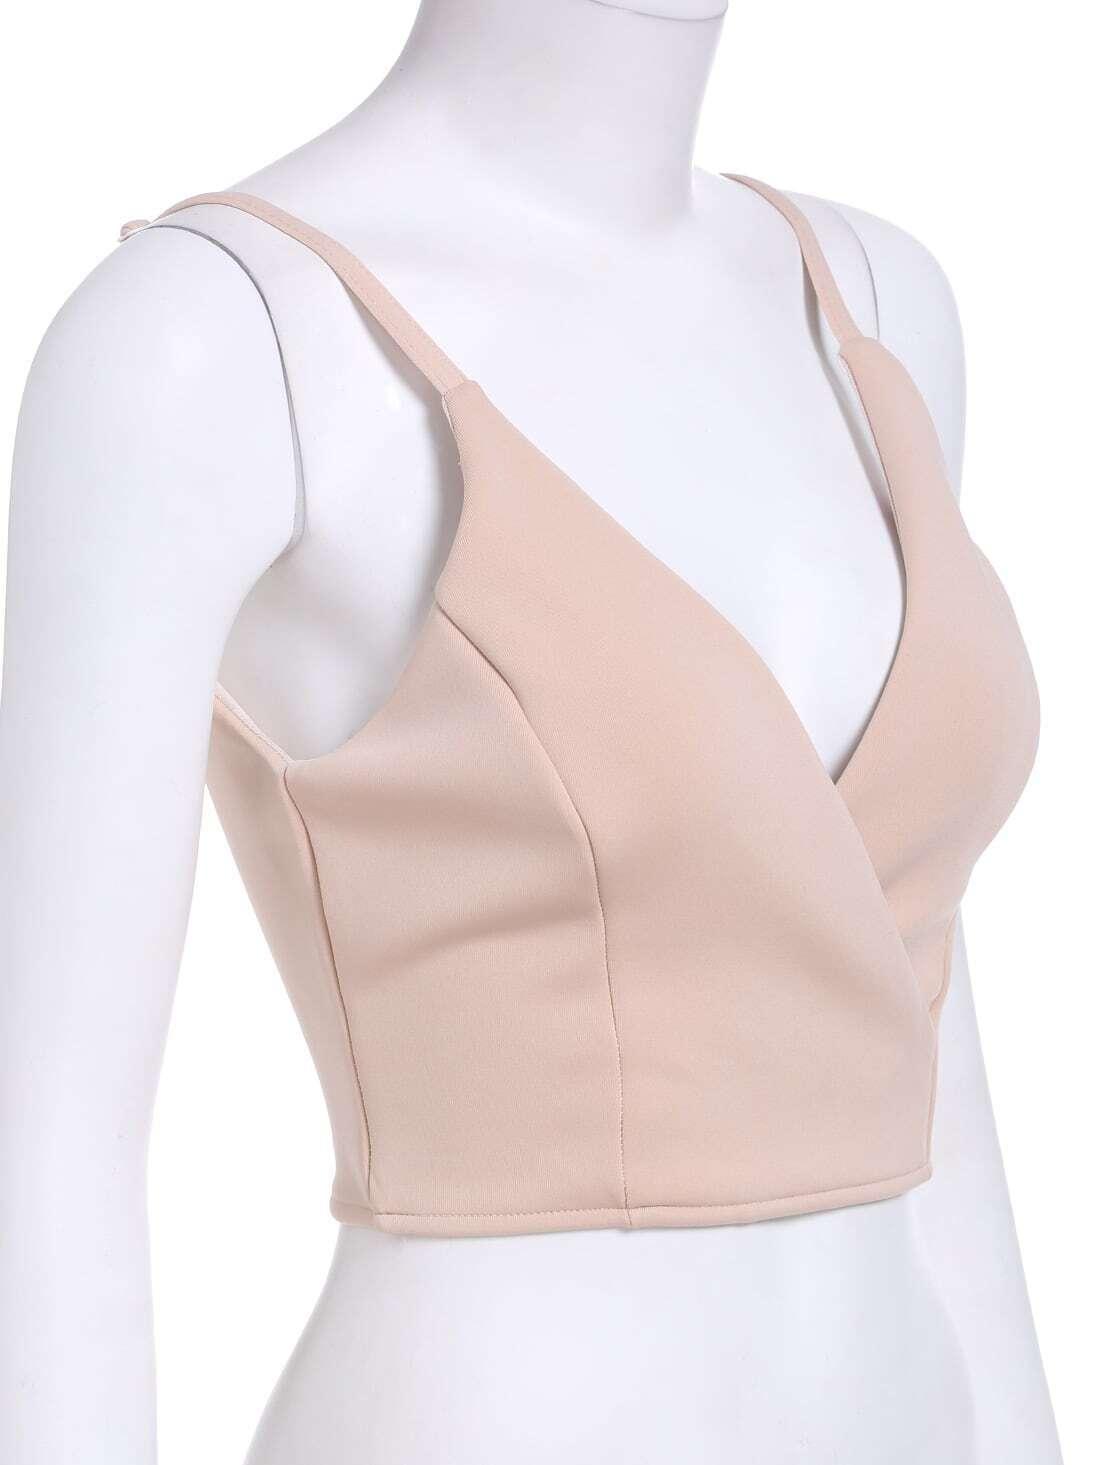 a4387455c012e Khaki Slip V Neck Cami Top EmmaCloth-Women Fast Fashion Online